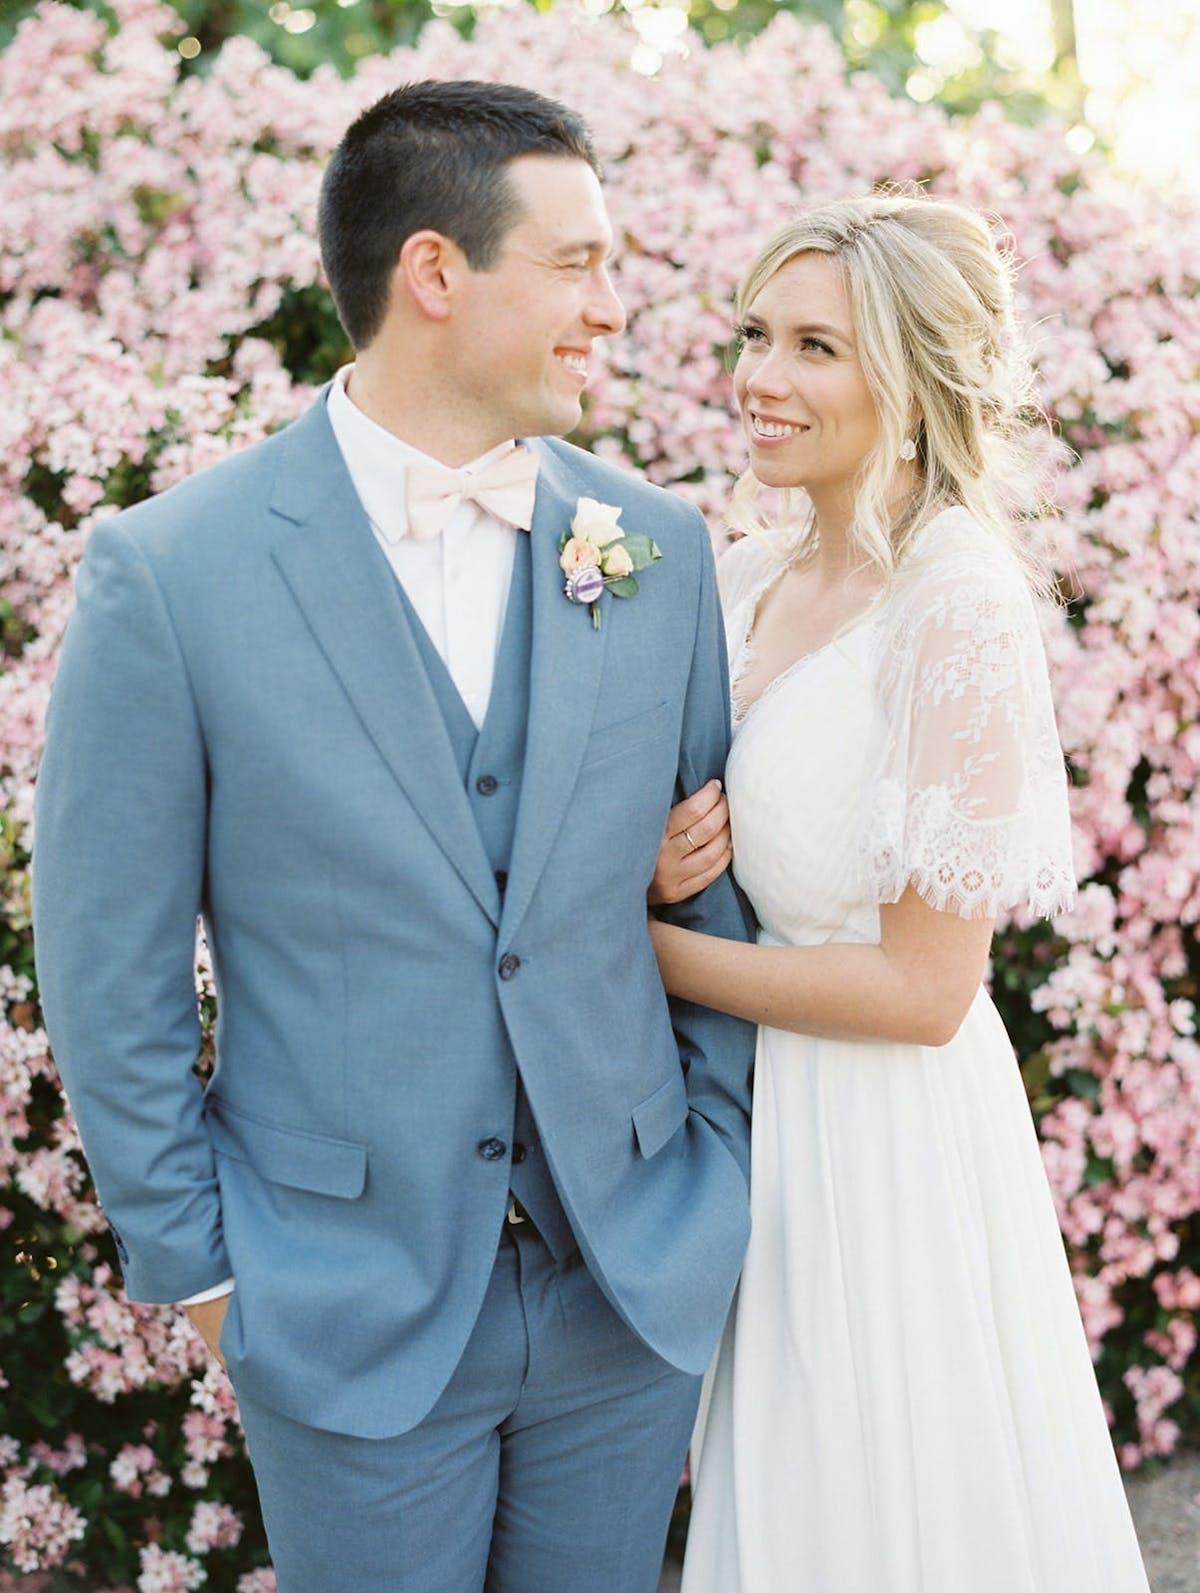 dusty blue wedding suits